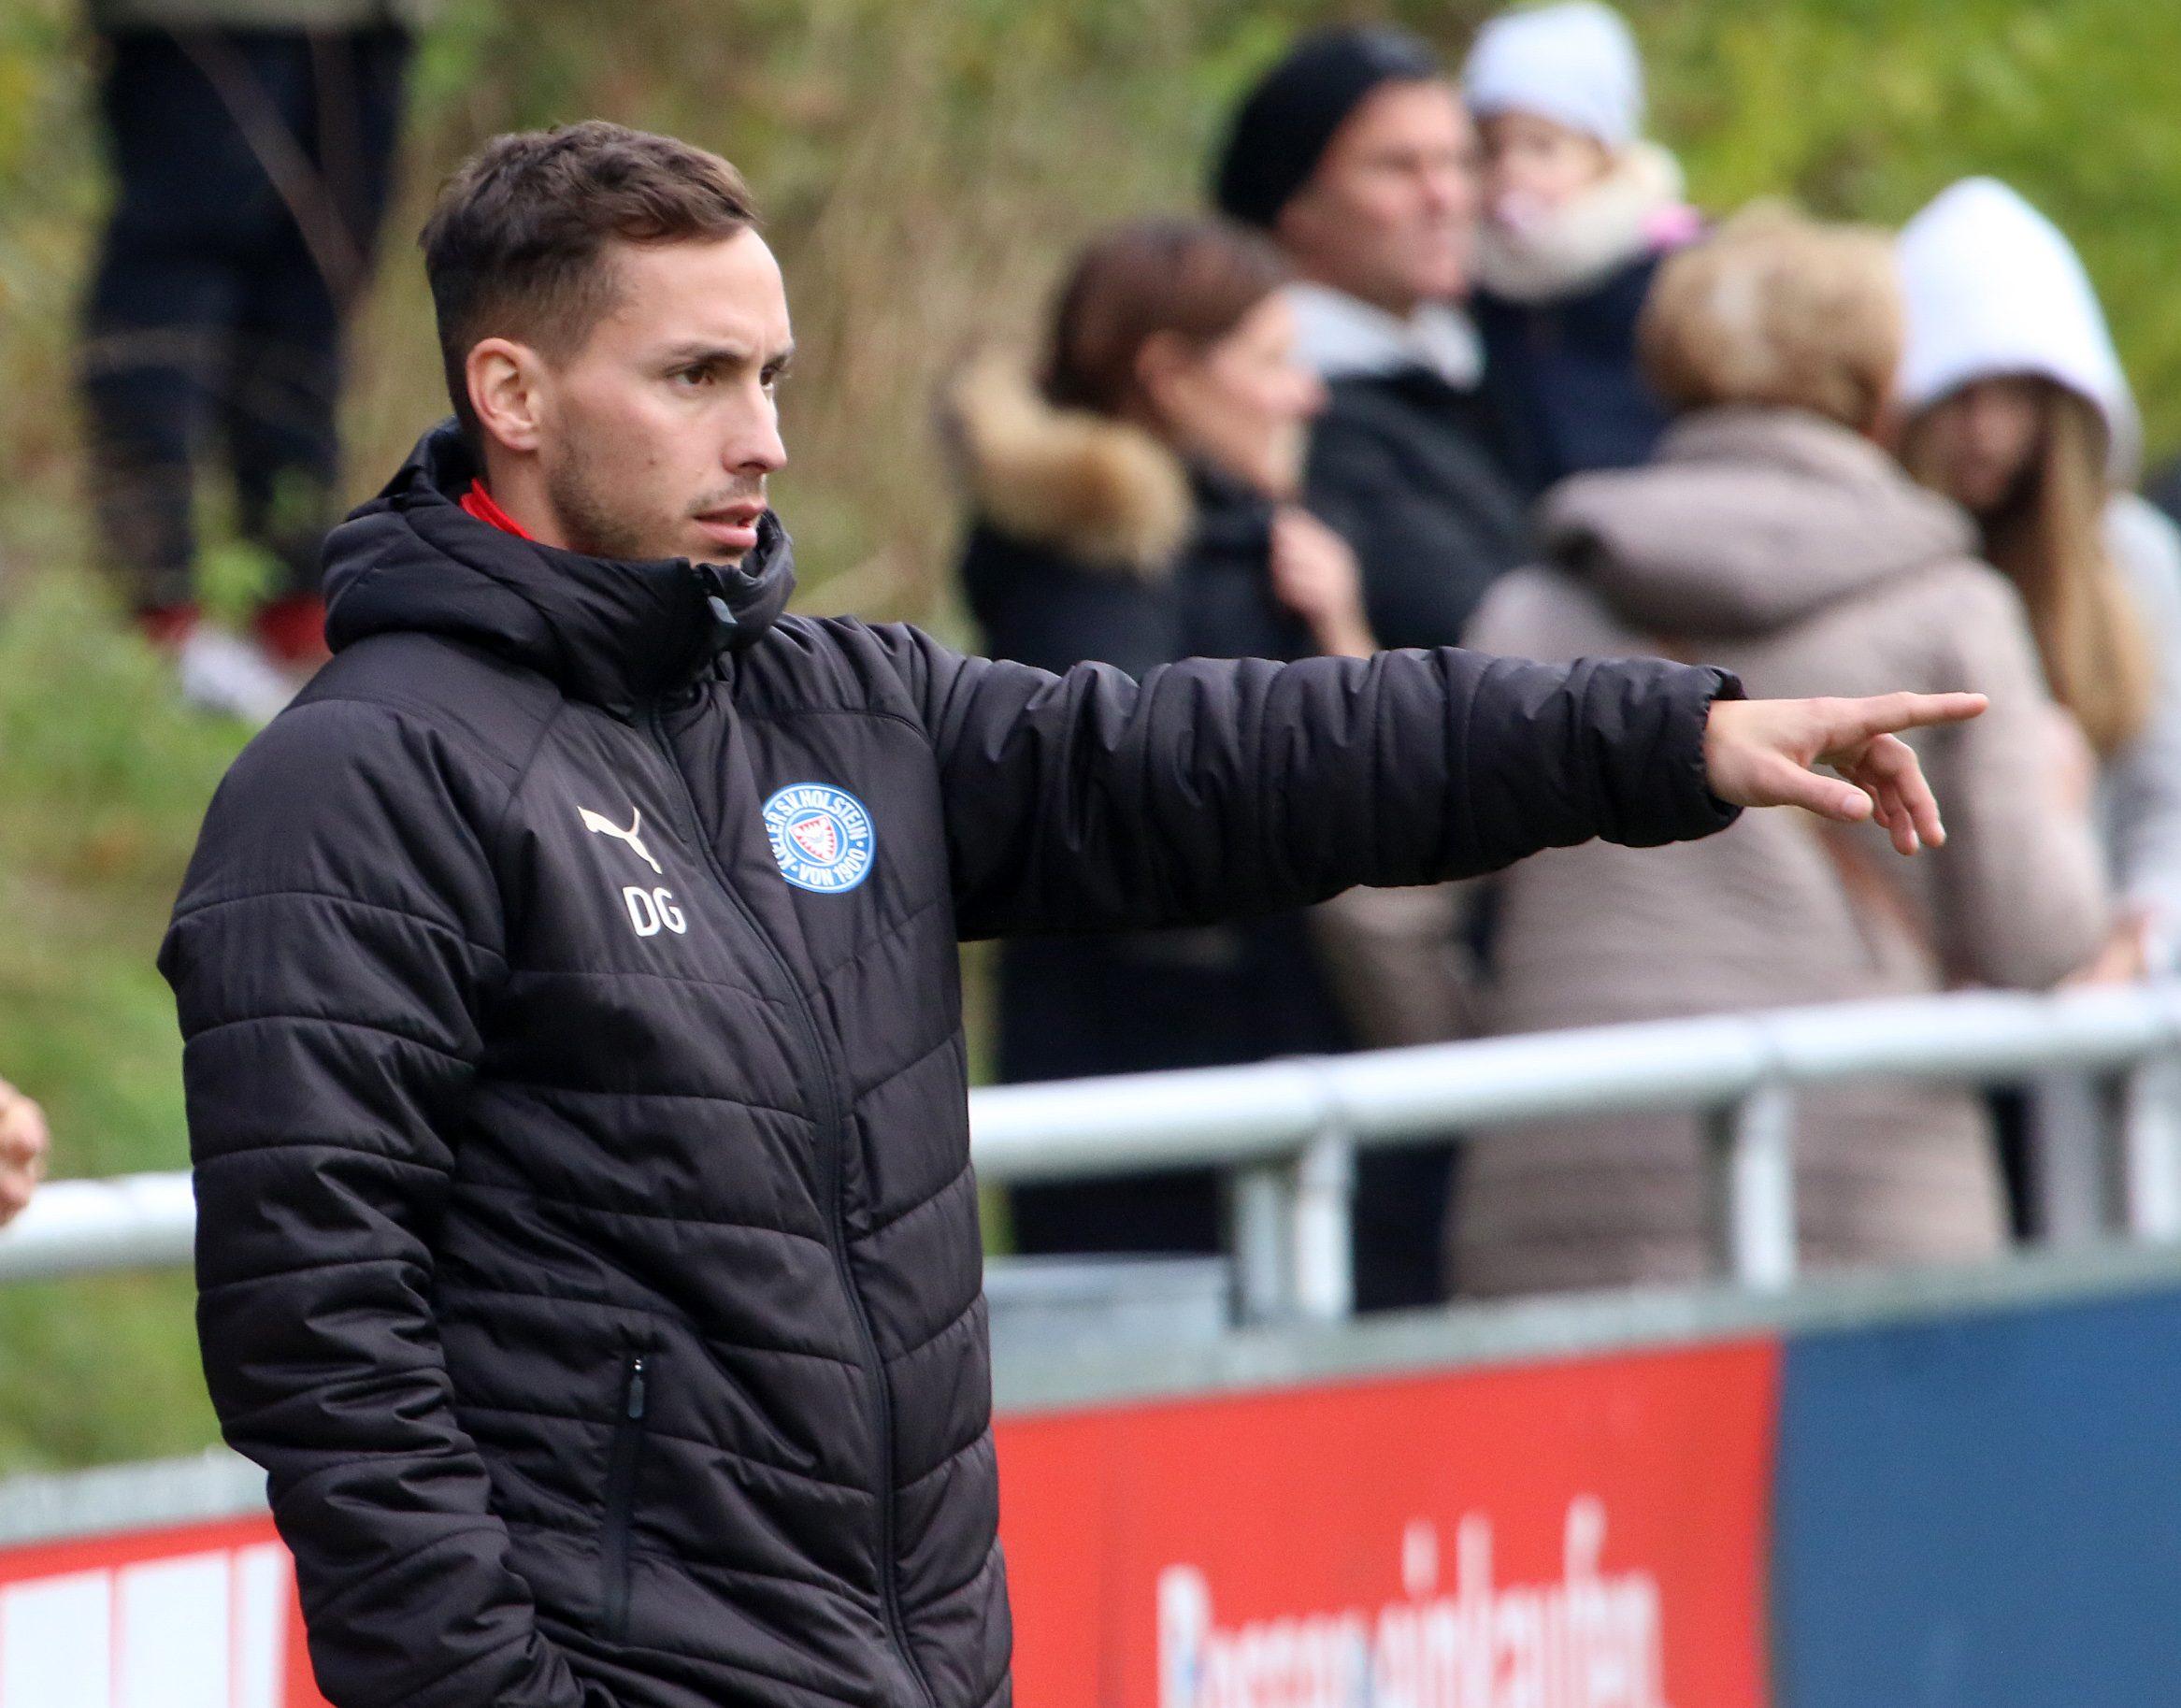 20191102 U19 Trainer Dominik Glawogger gegen St Pauli 04